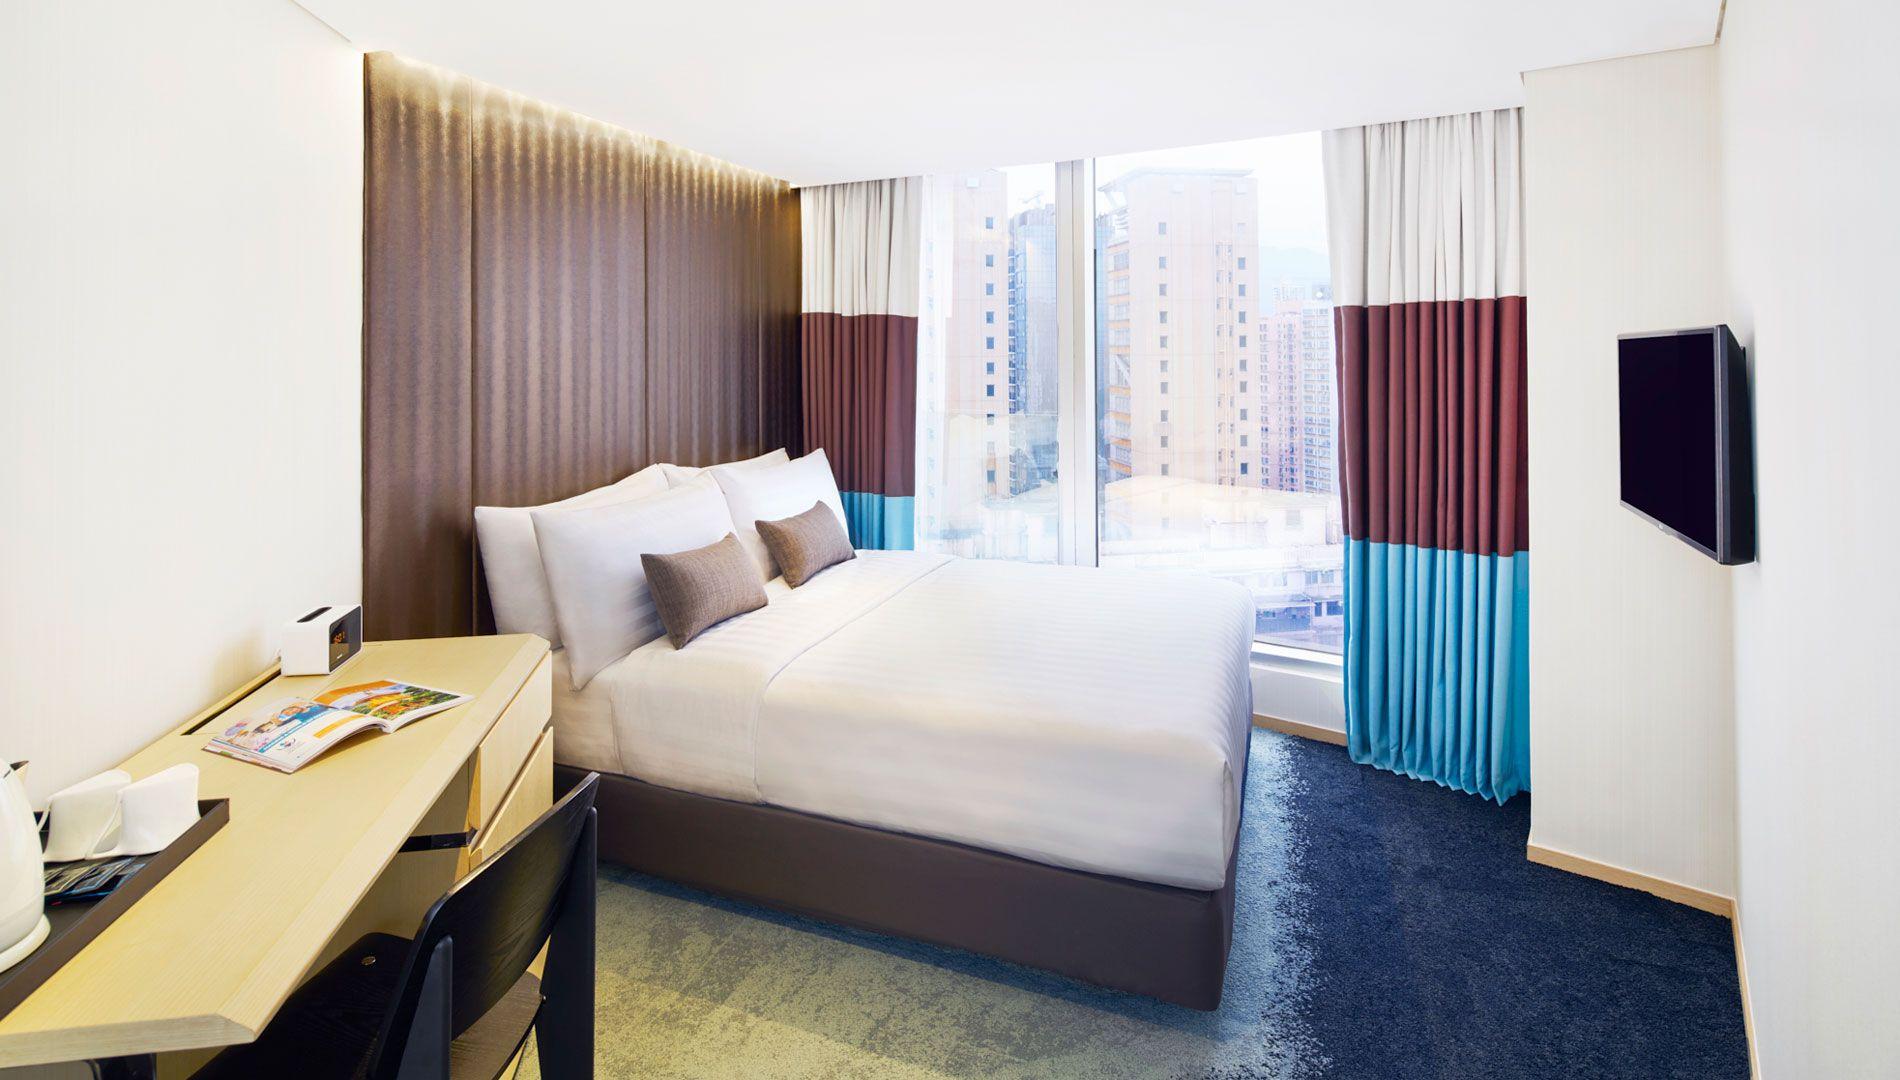 Hotel 108 旺角時鐘酒店房間